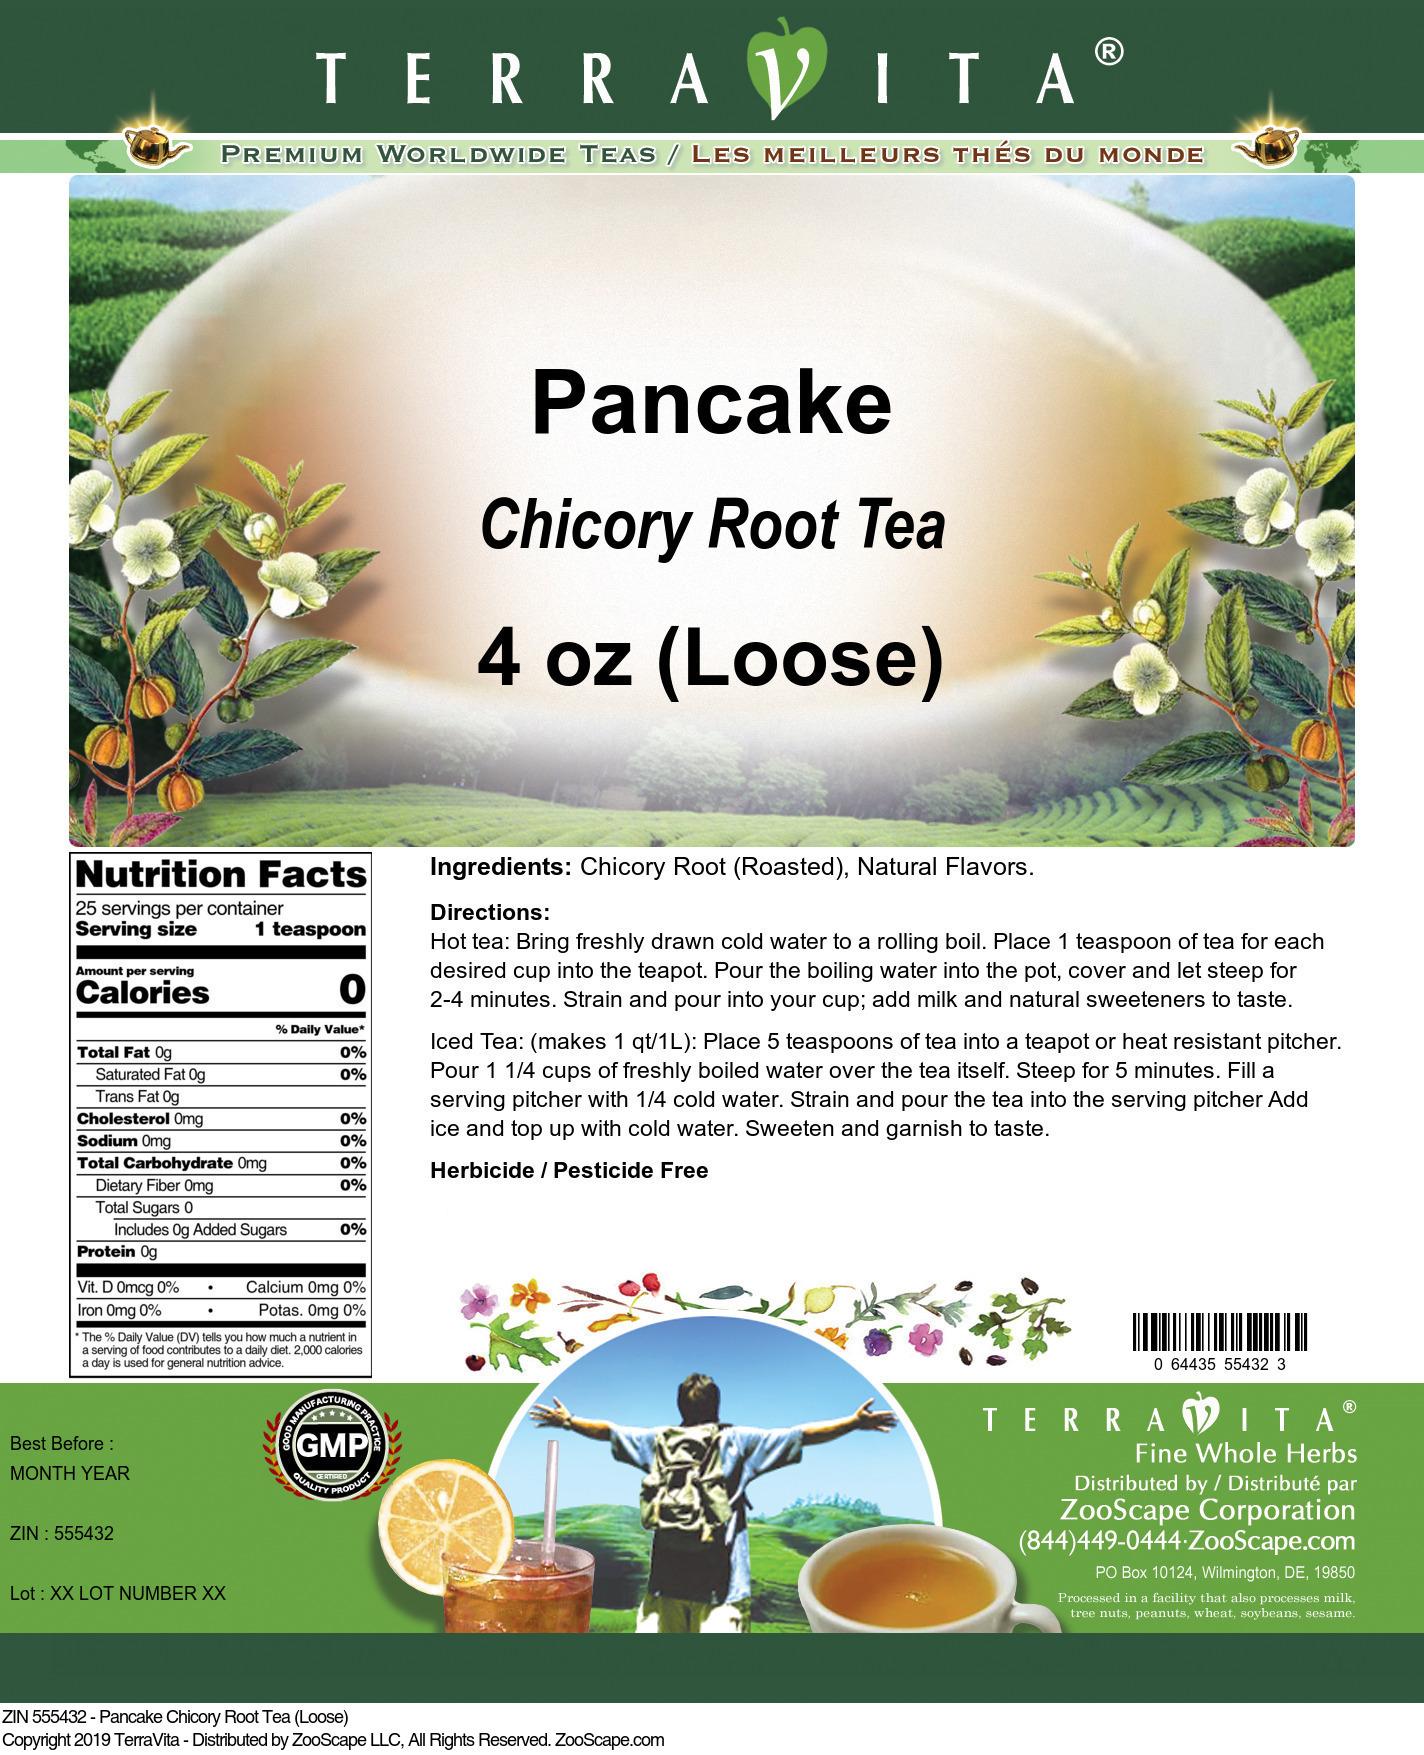 Pancake Chicory Root Tea (Loose)